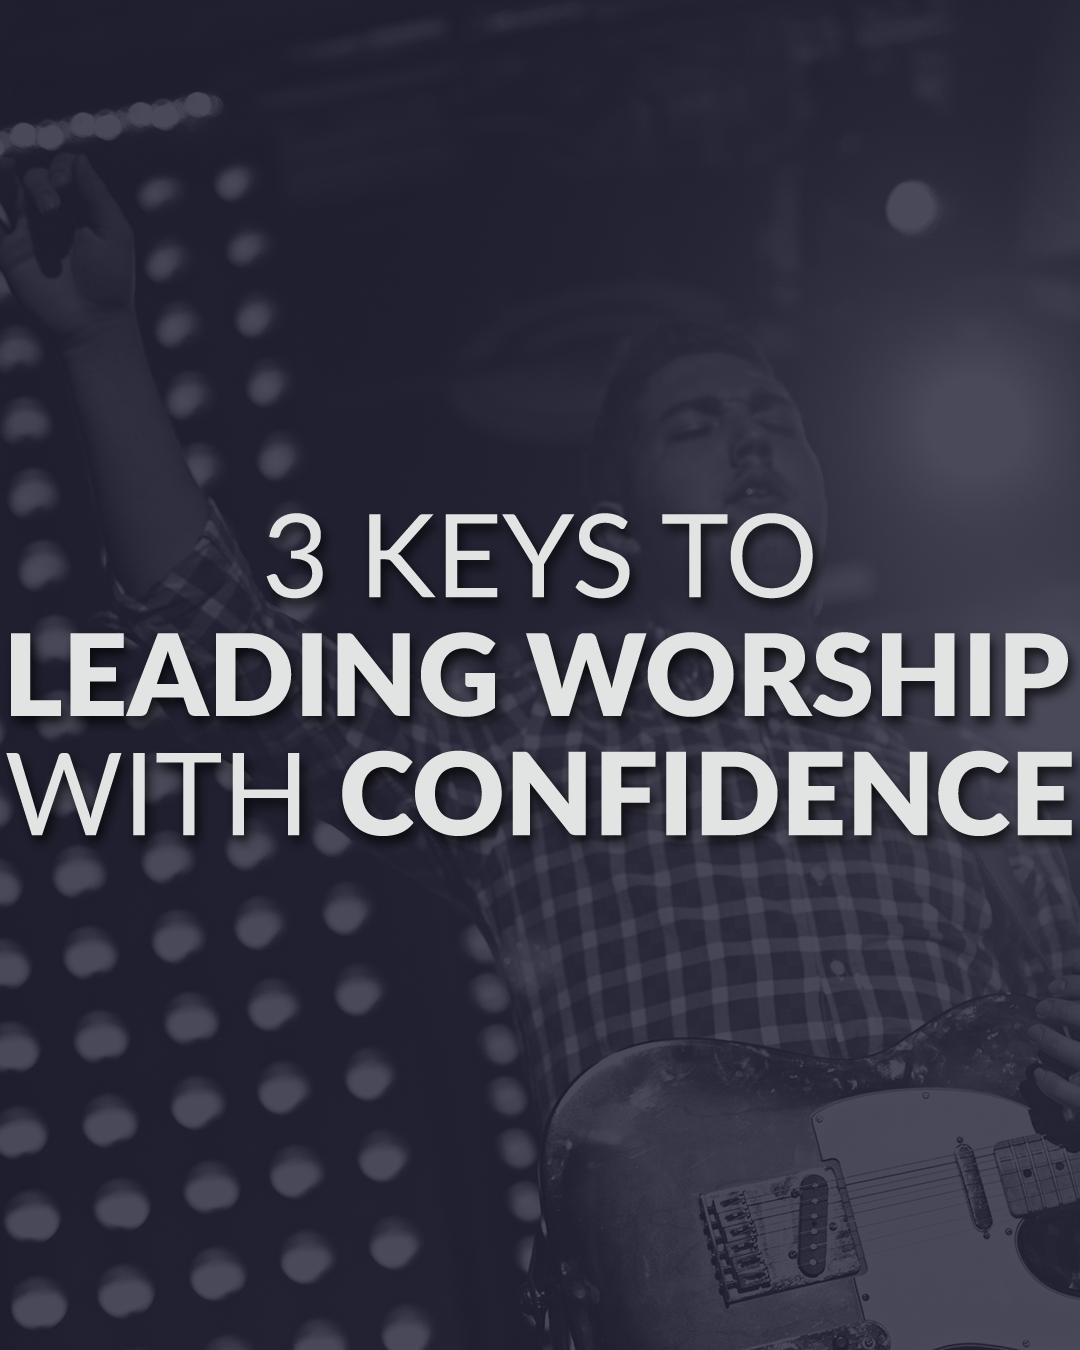 3 Keys To Leading Worship Confidently